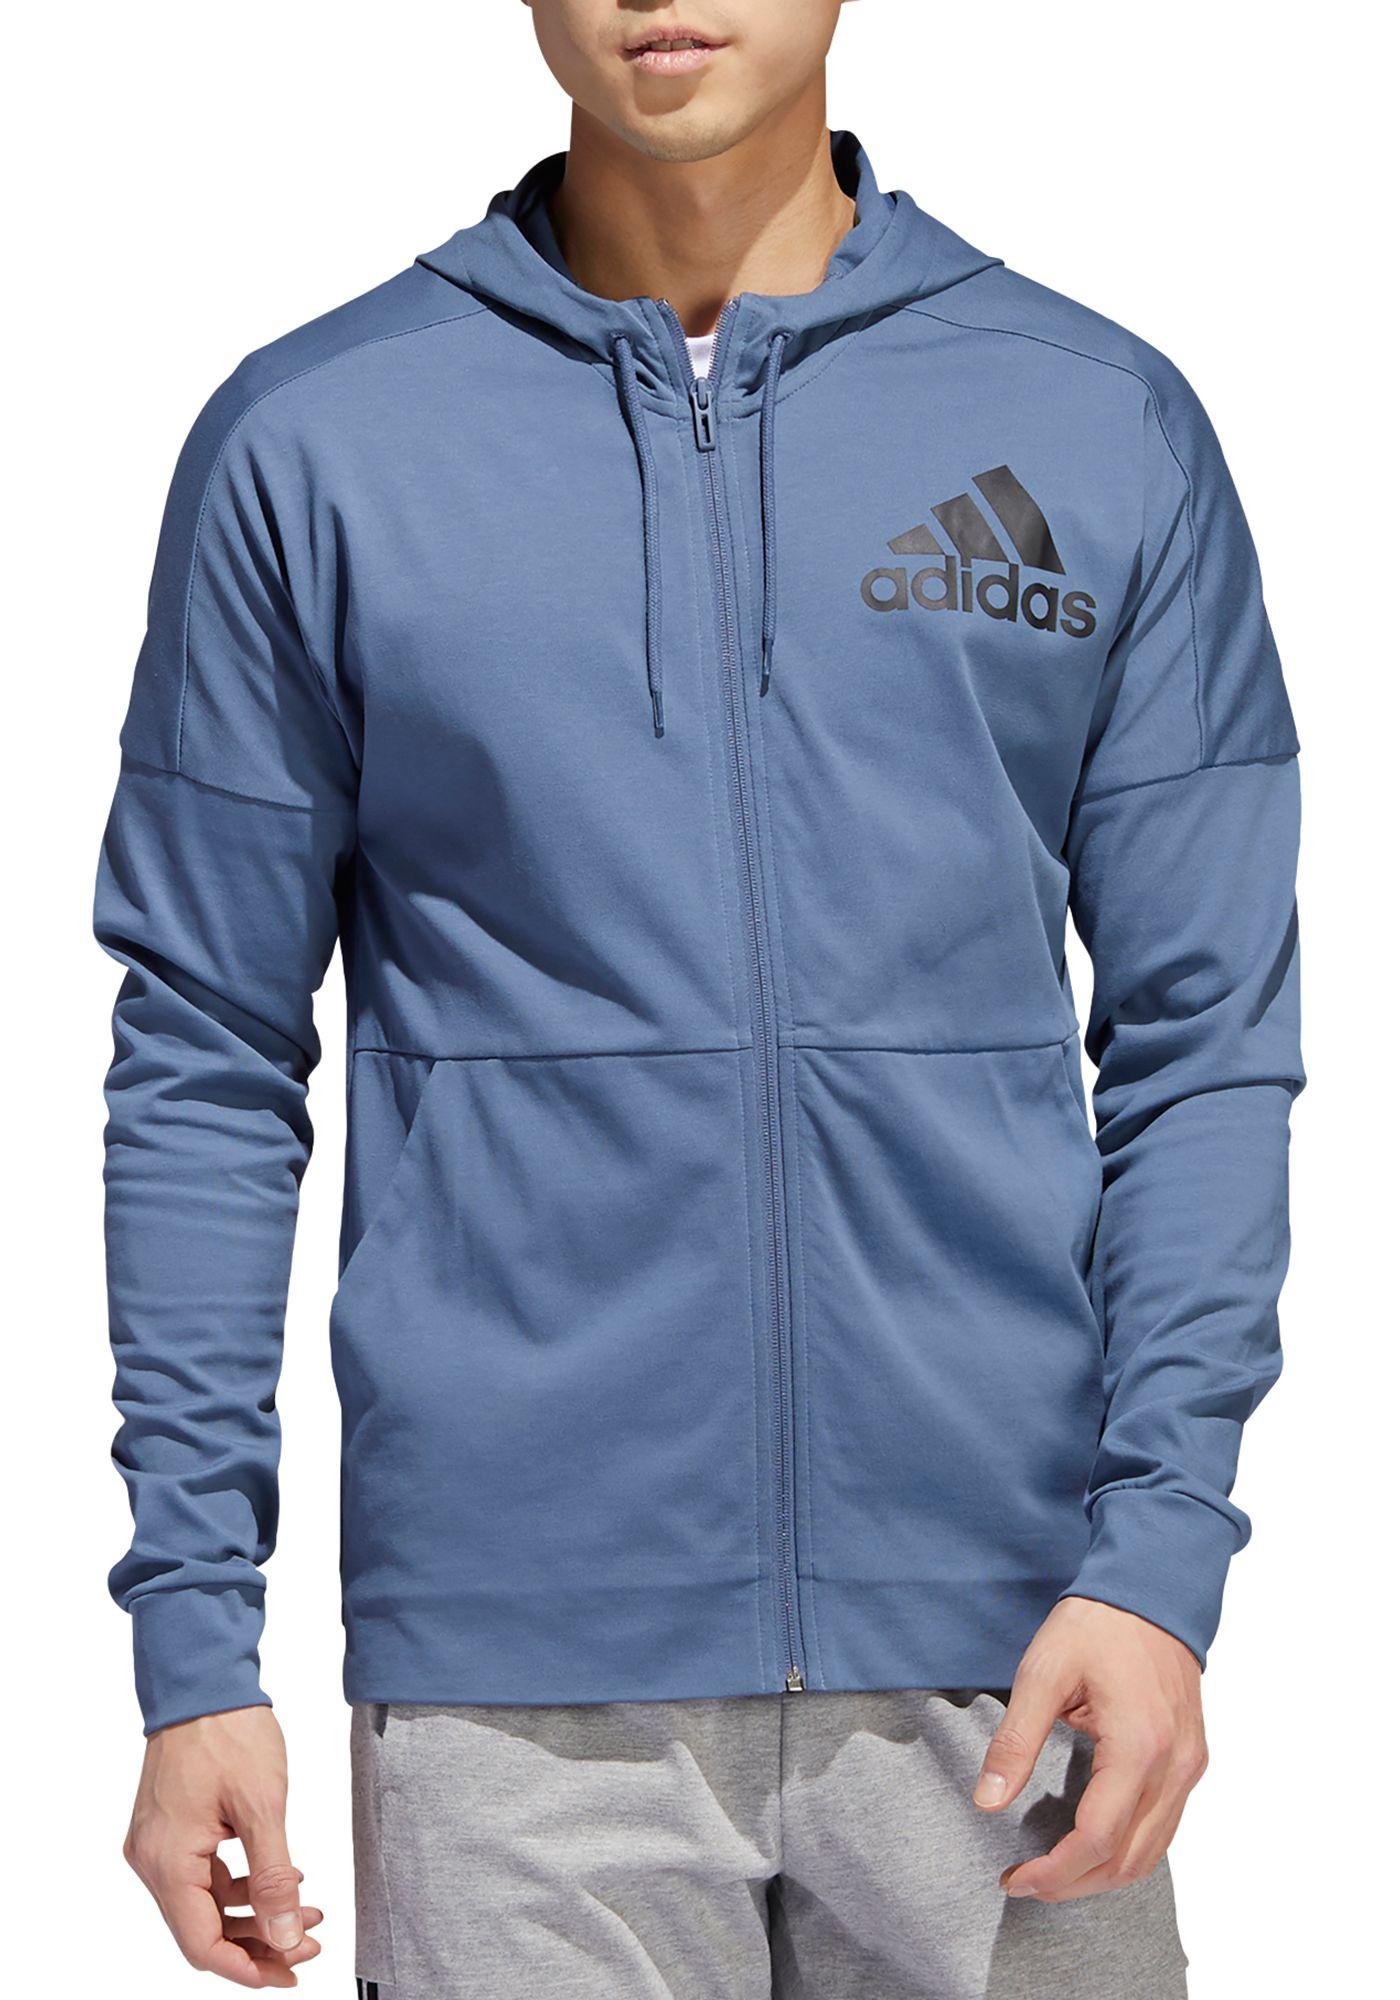 adidas Men's Athletics Full Zip Hoodie